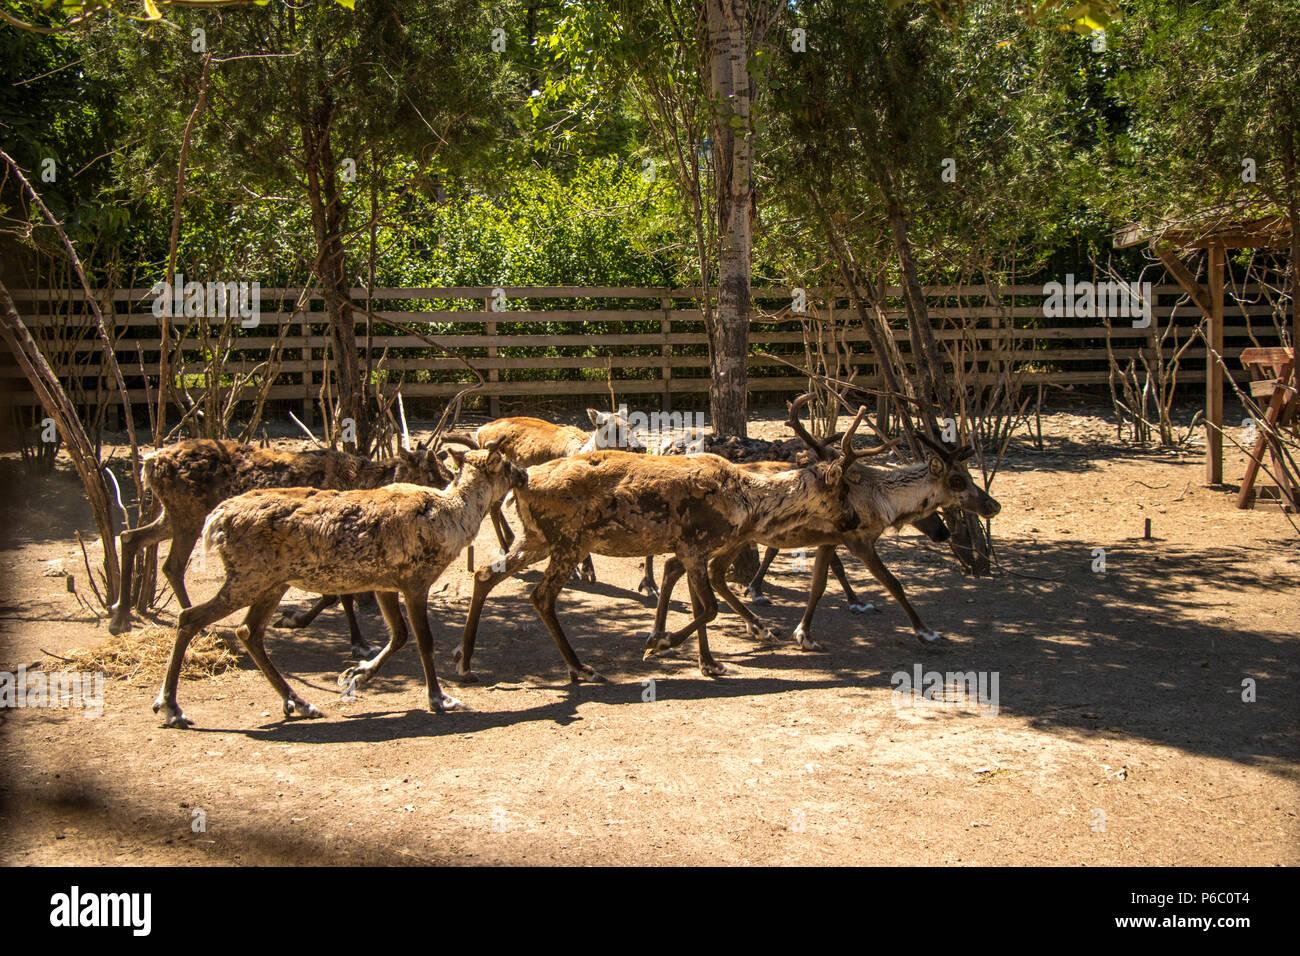 Reindeers running at zoo scene - Stock Image